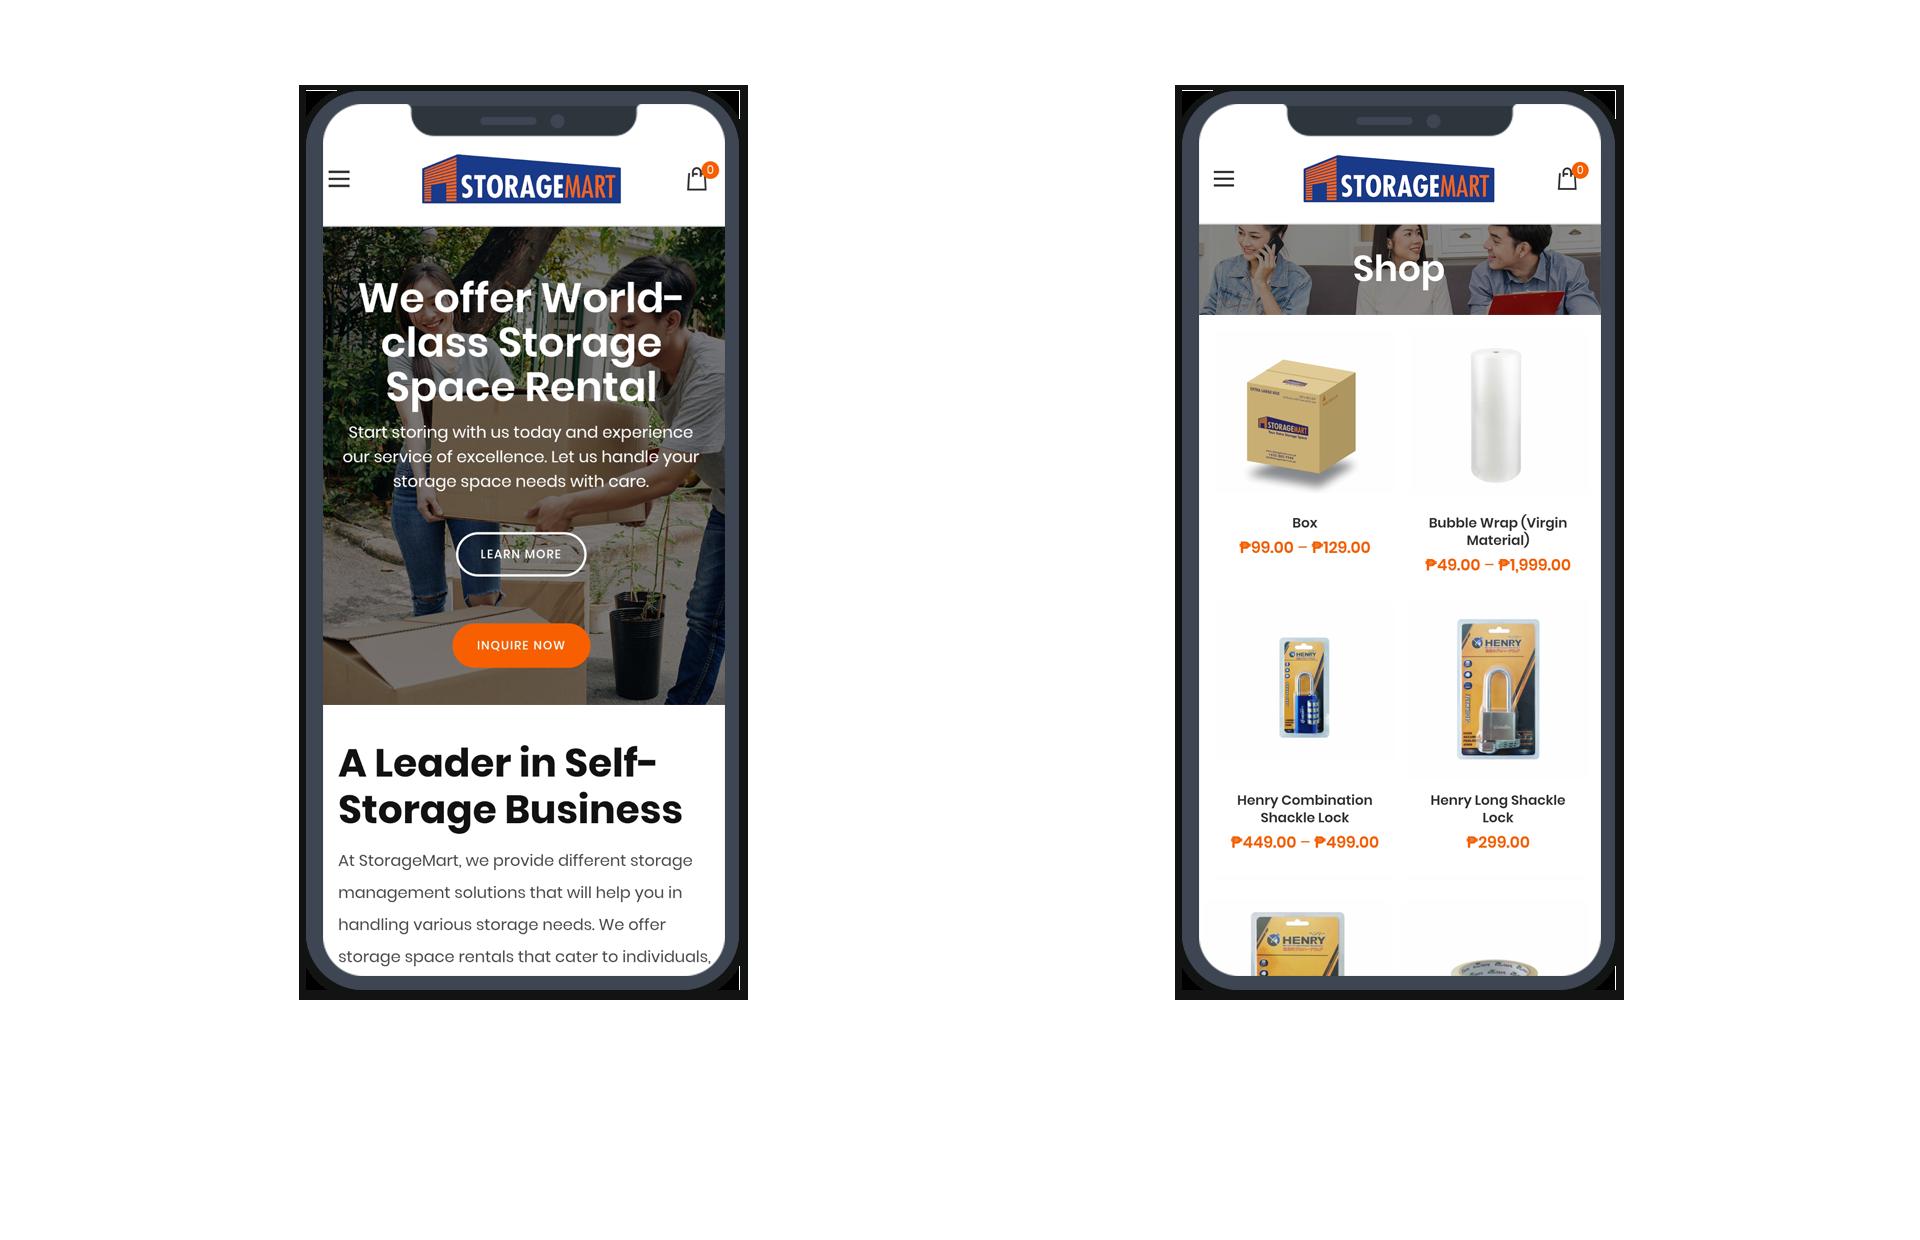 StorageMart Mobile